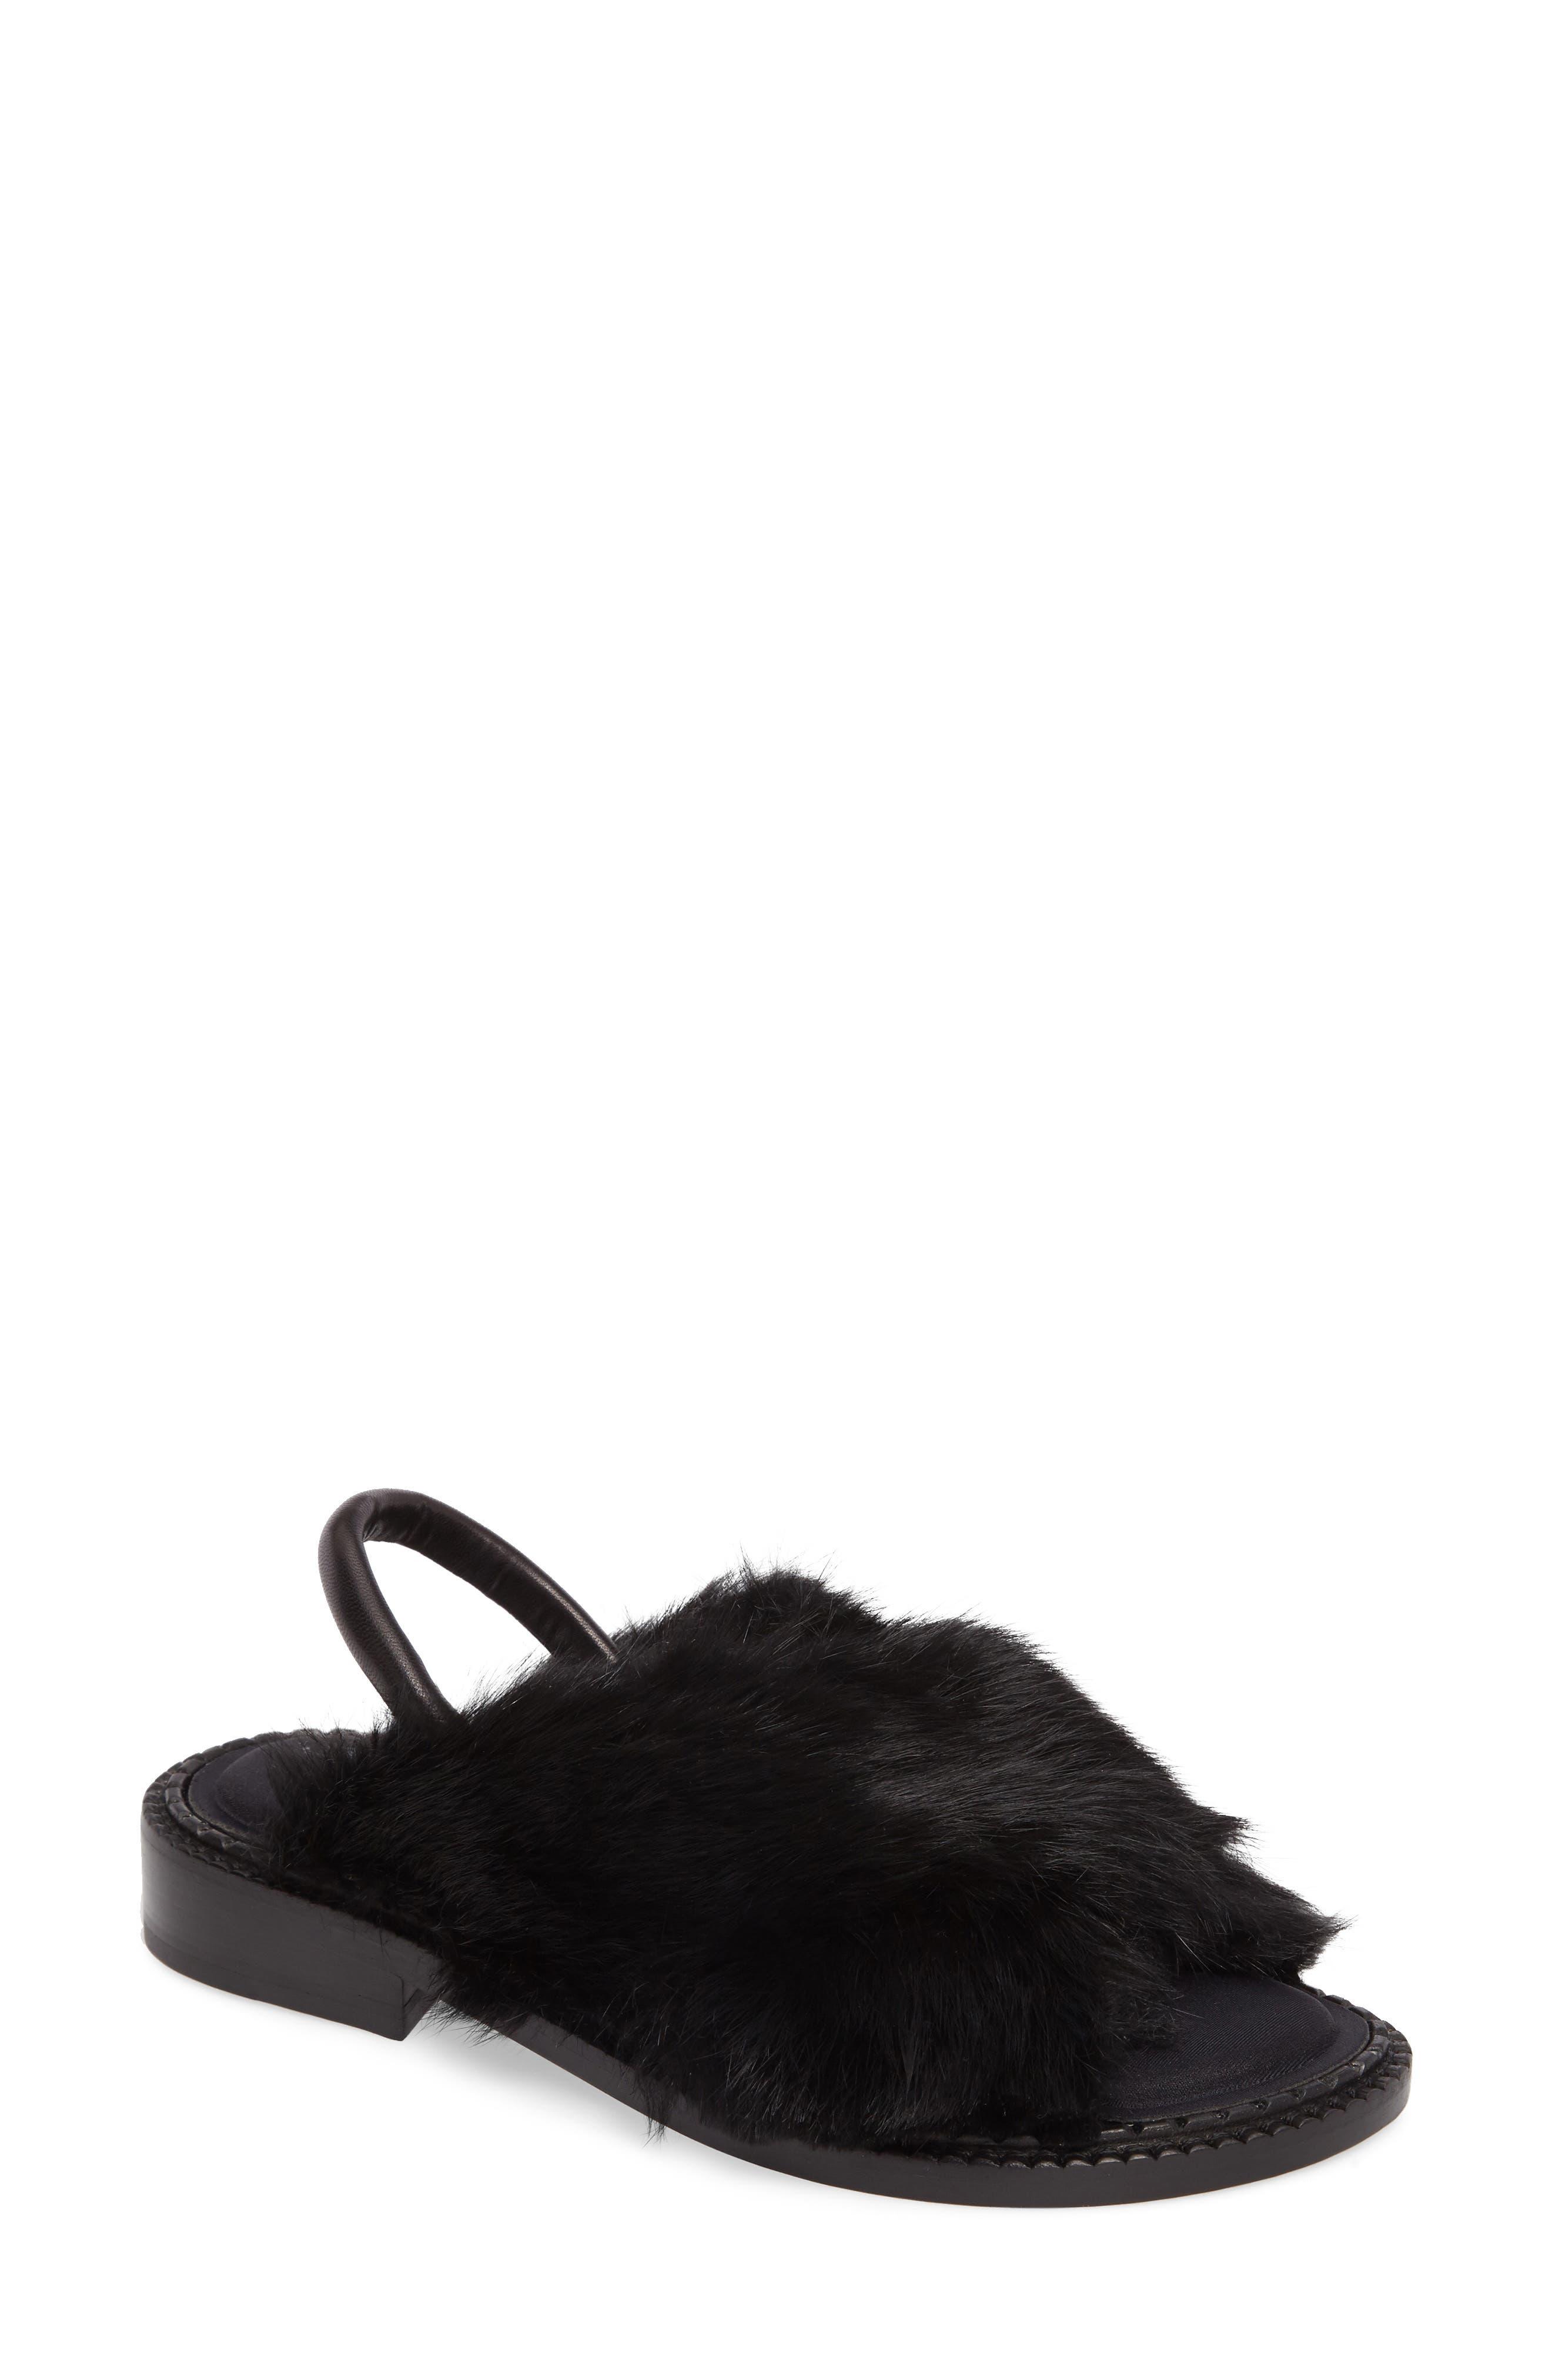 Bloss Genuine Fur Sandal,                             Main thumbnail 1, color,                             004